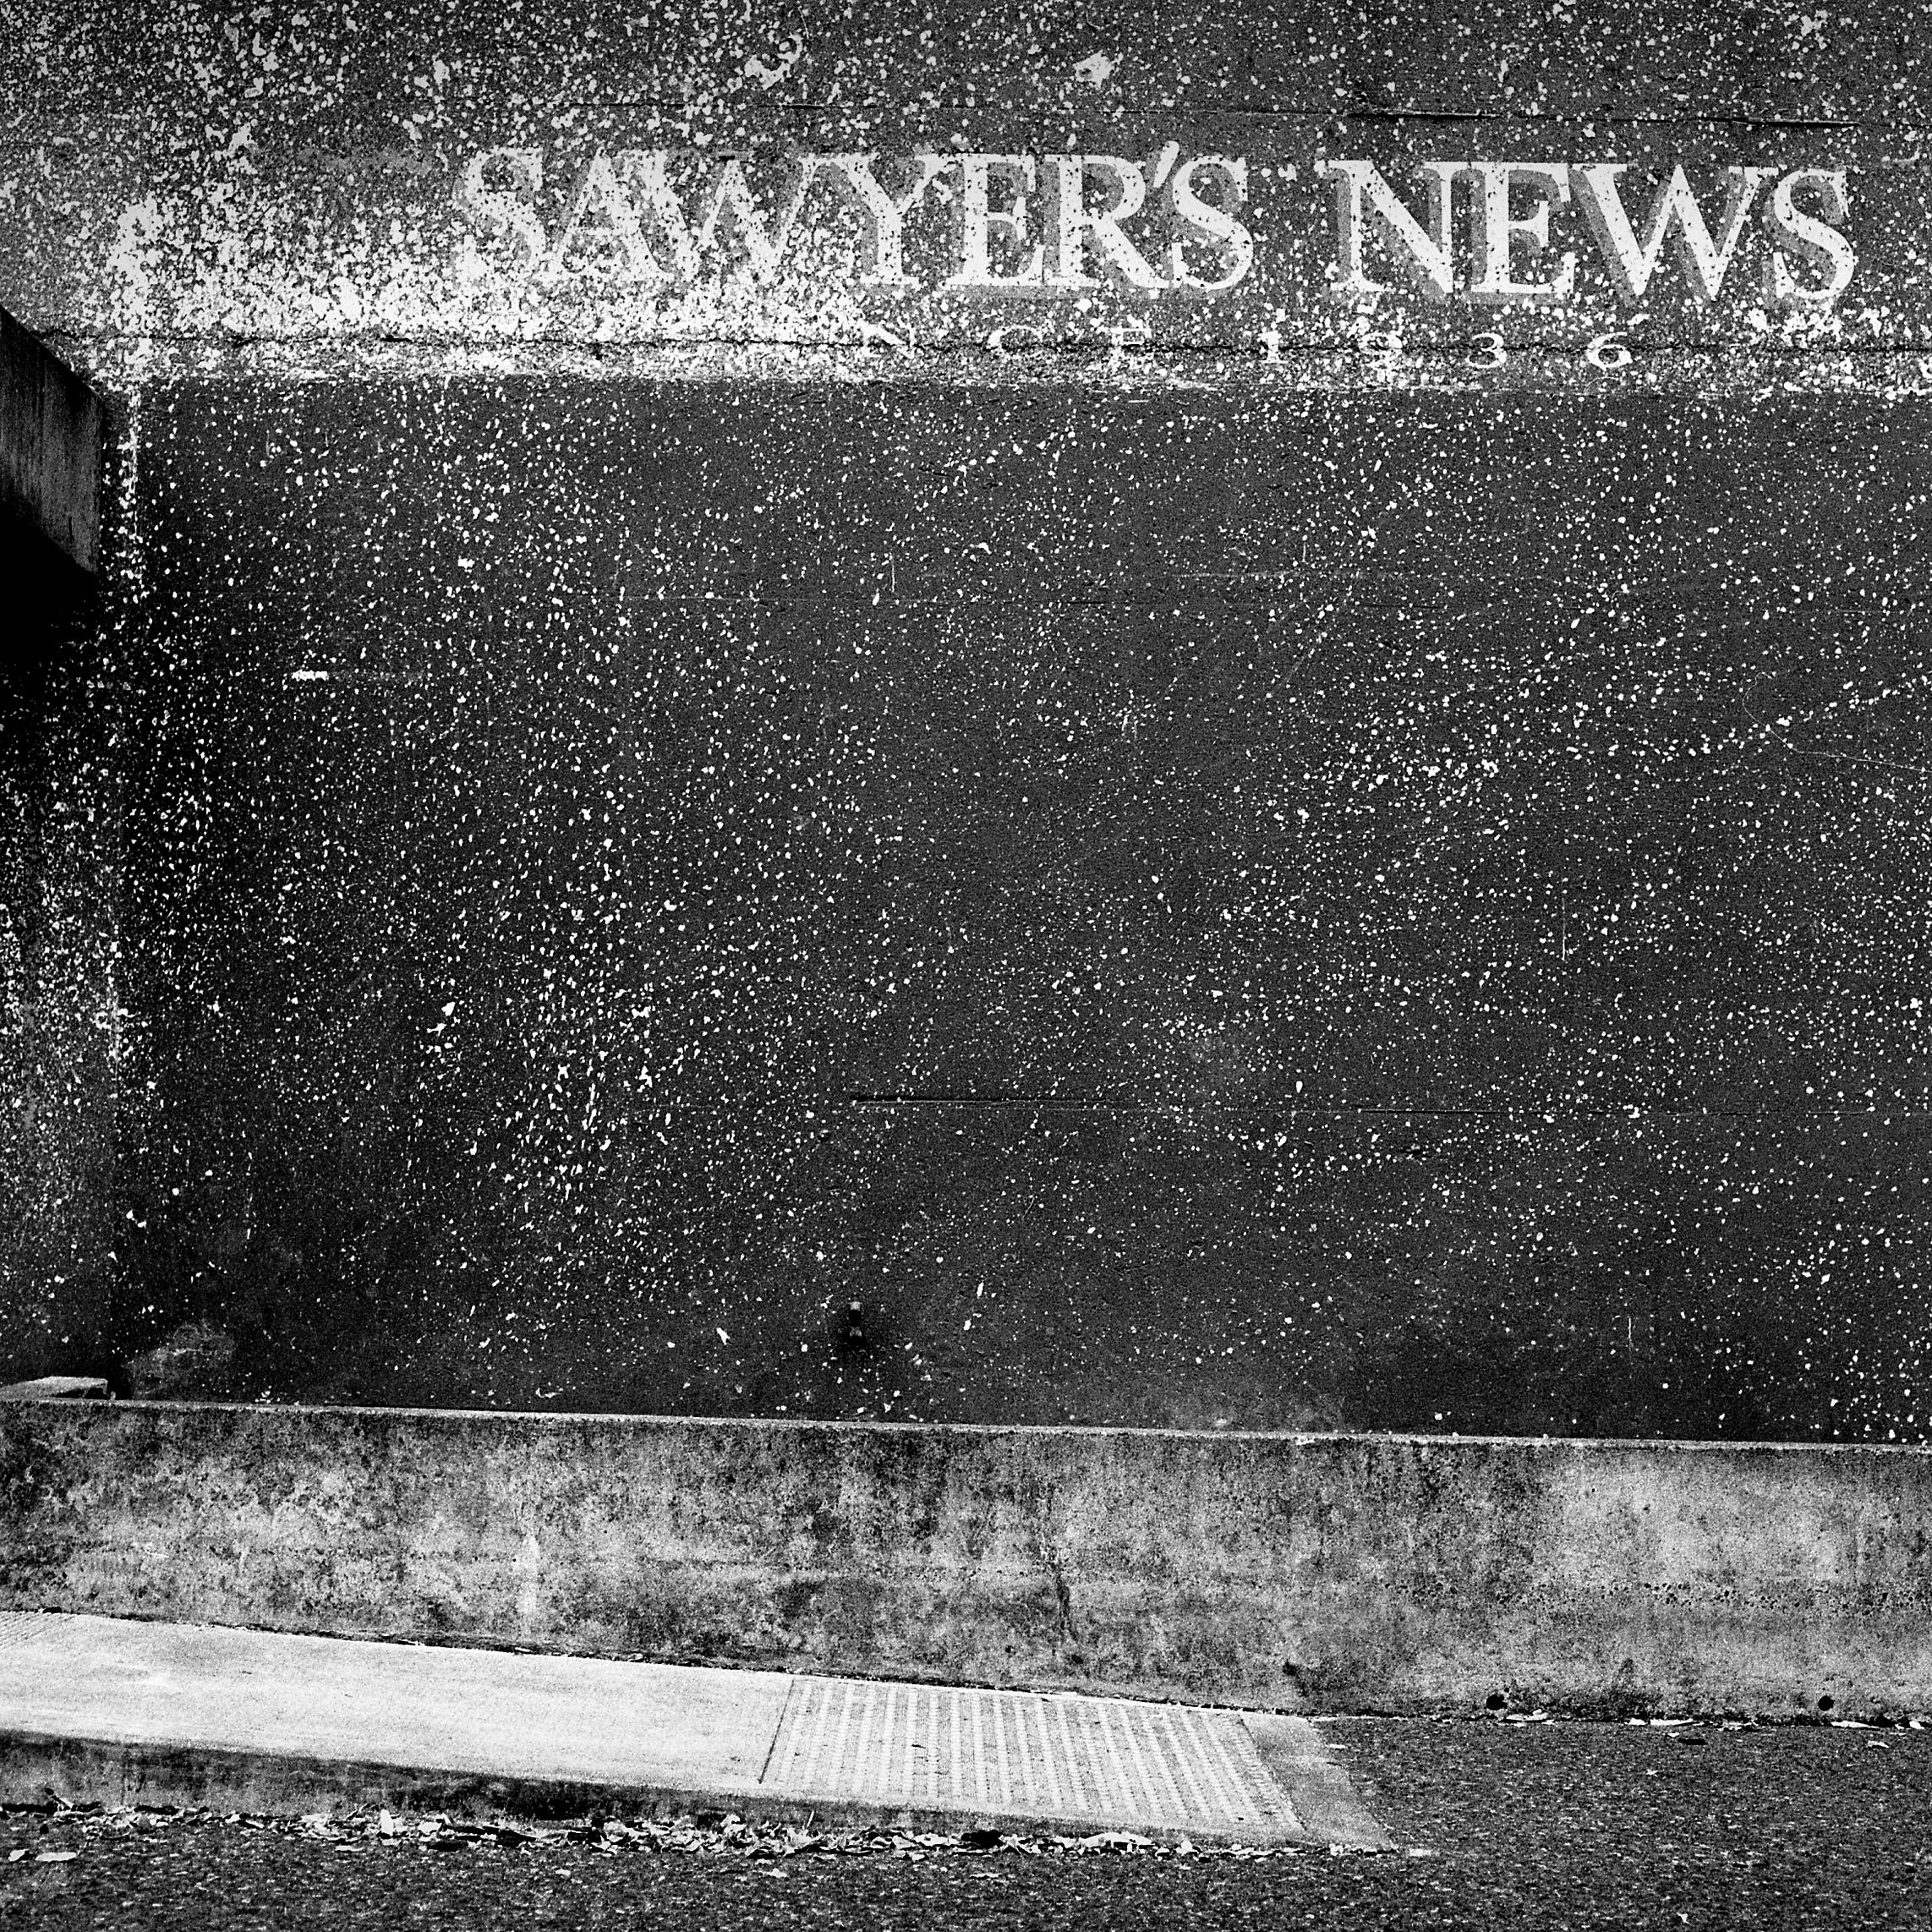 Sawyer's News, Santa Rosa, CA 2018